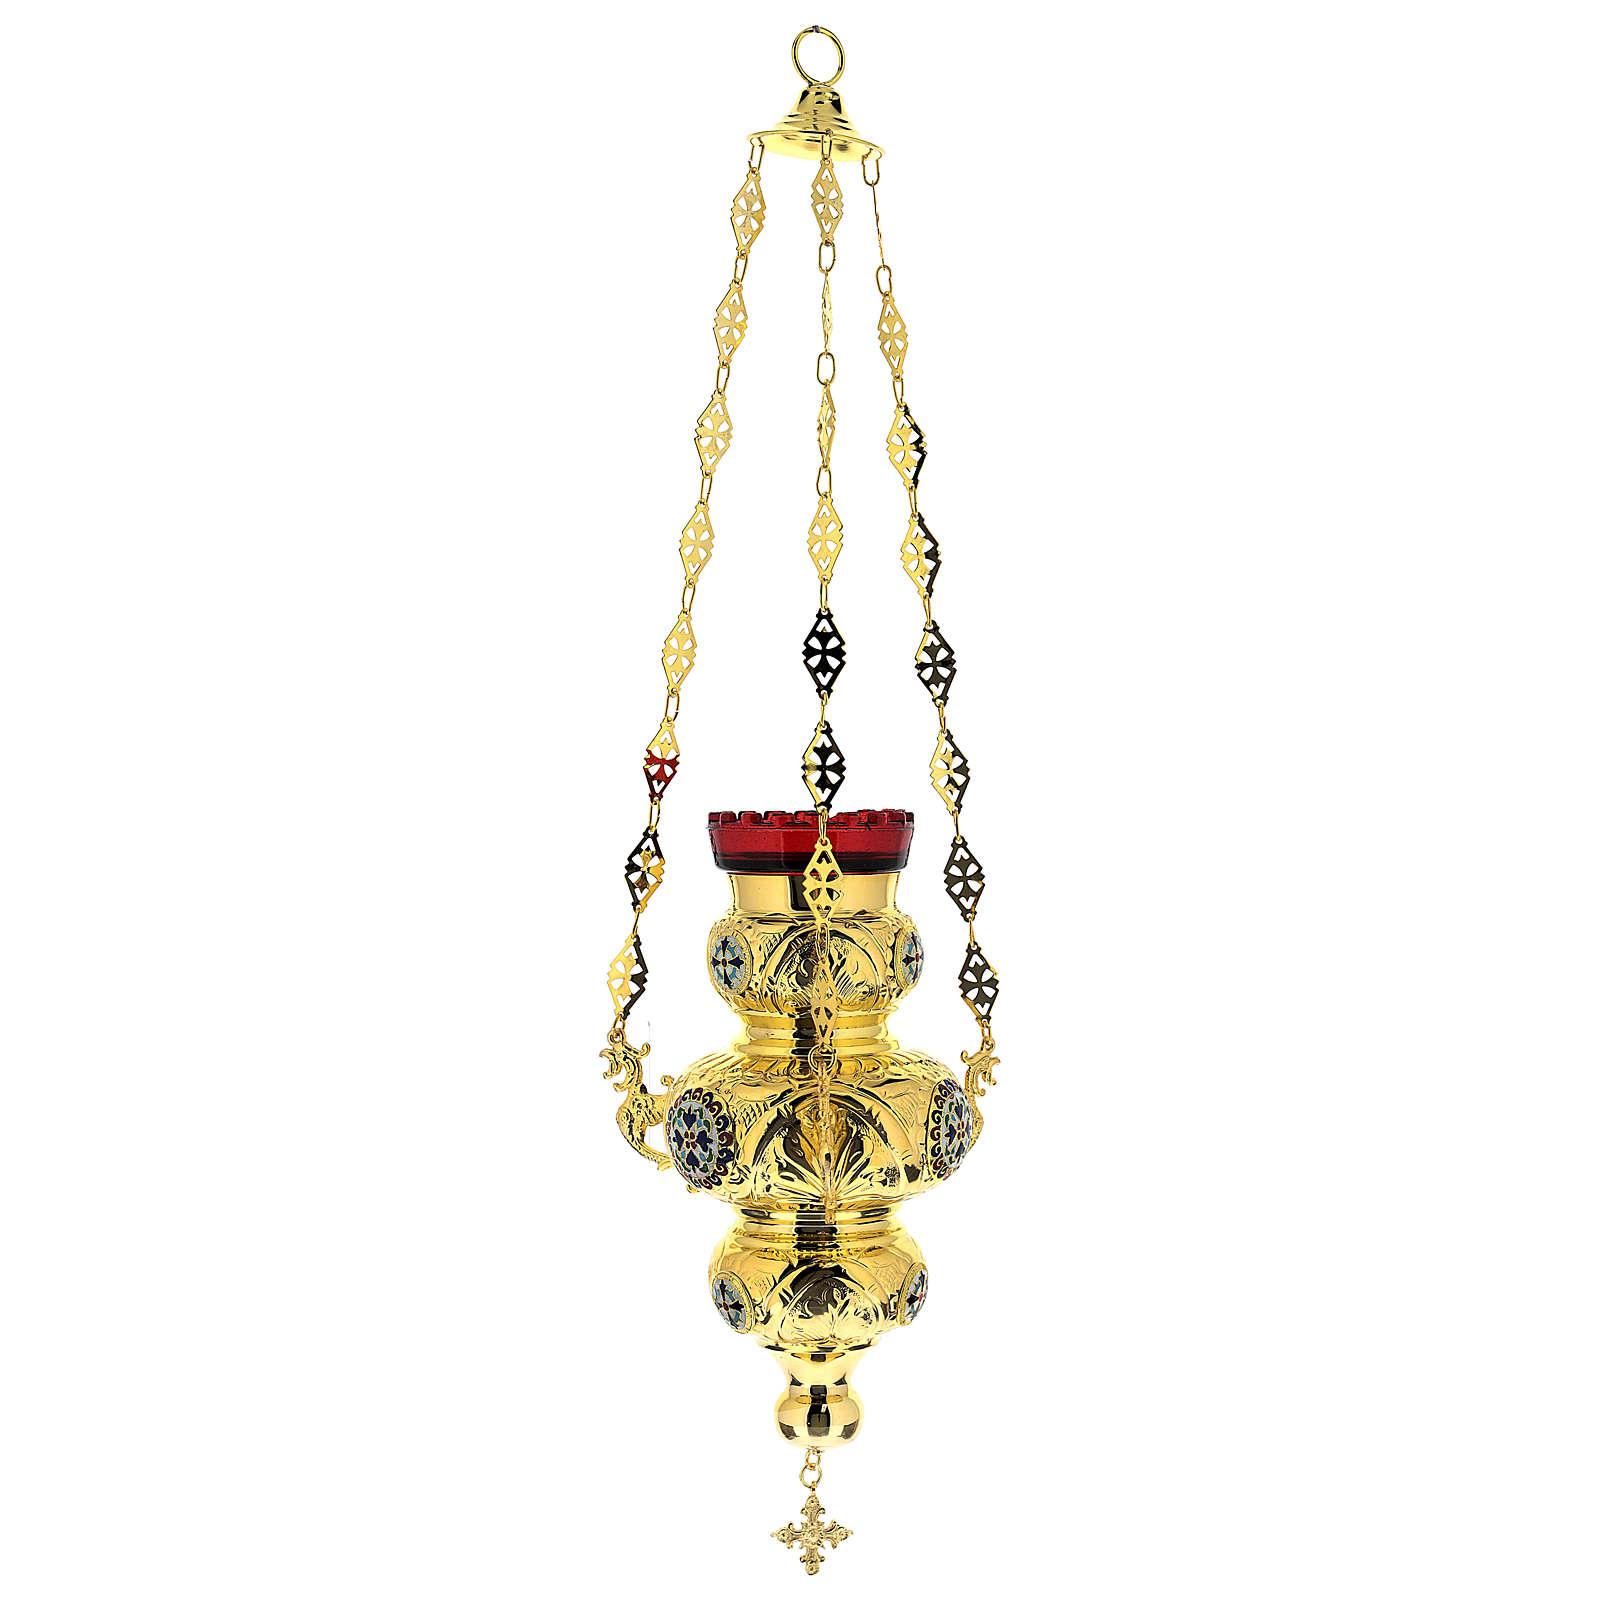 Lampe orthodoxe laiton doré 26x17 cm 3